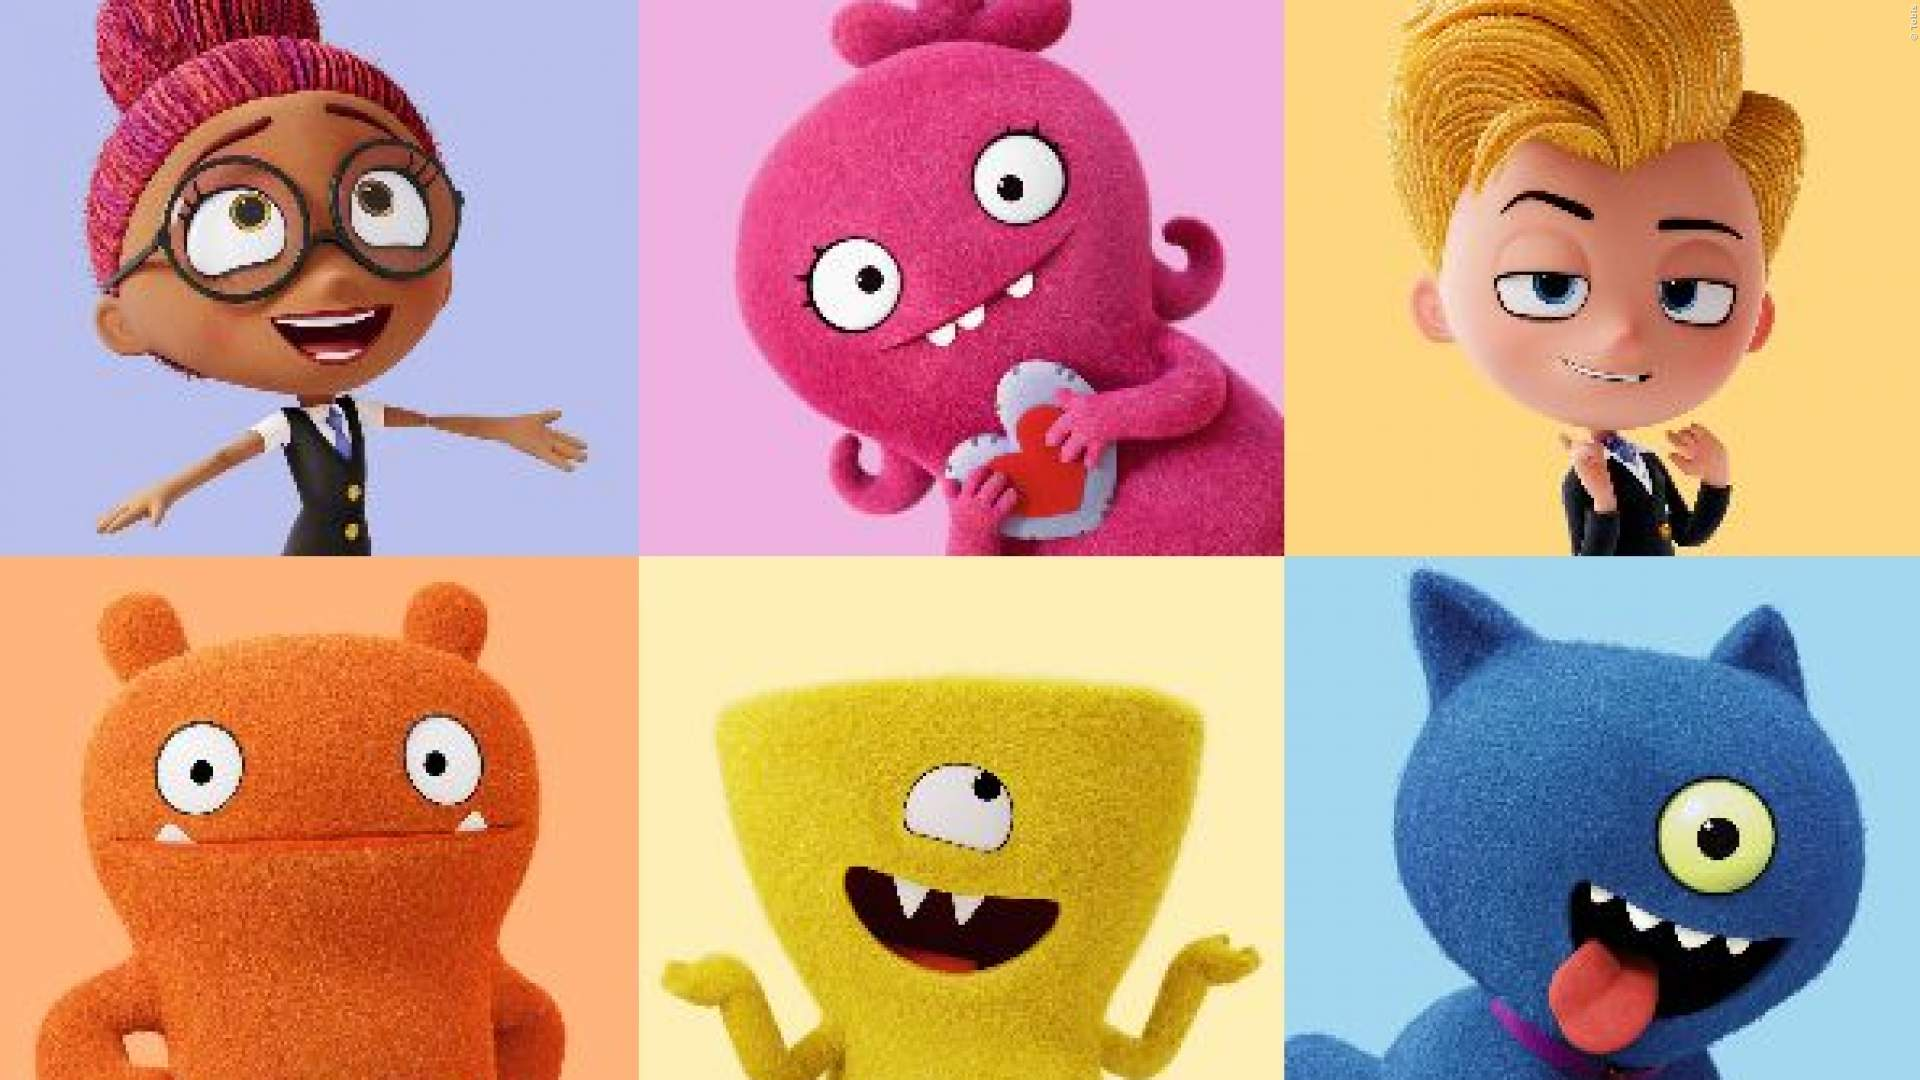 ALTERSFREIGABE: Der Animationsfilm 'Ugly Dolls' ist freigegeben ab FSK